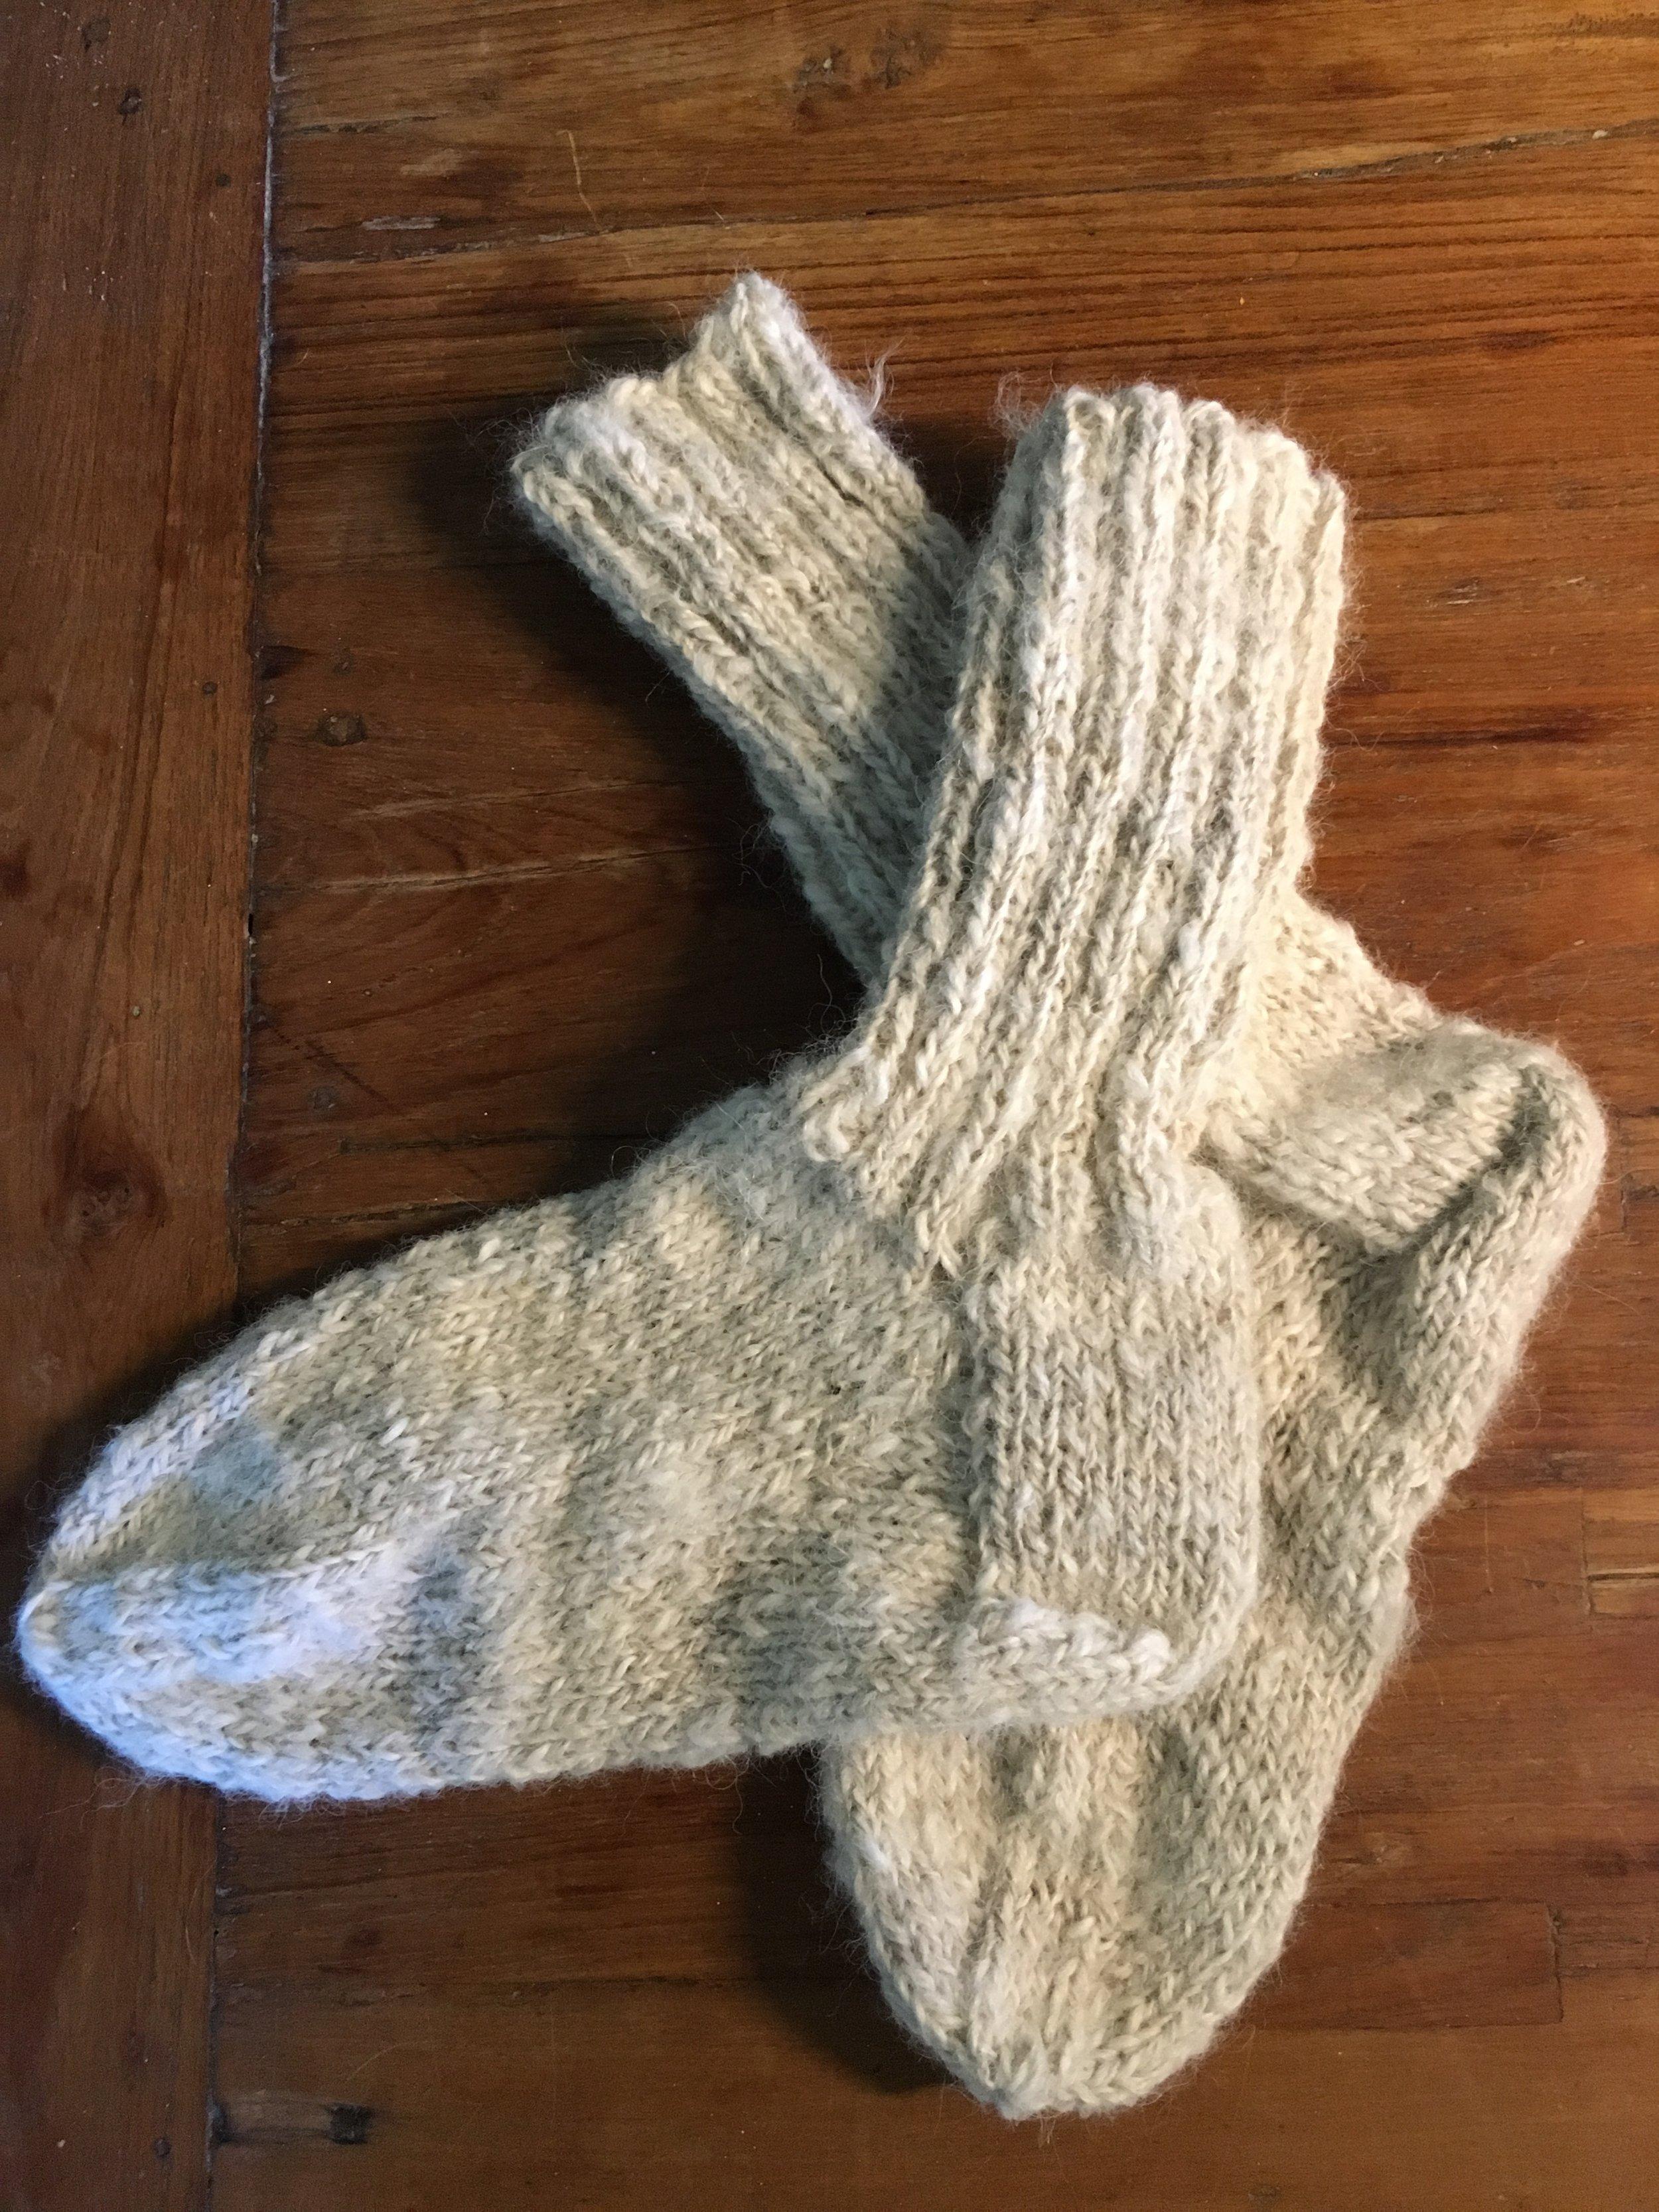 Socks - Alpaca bed socks